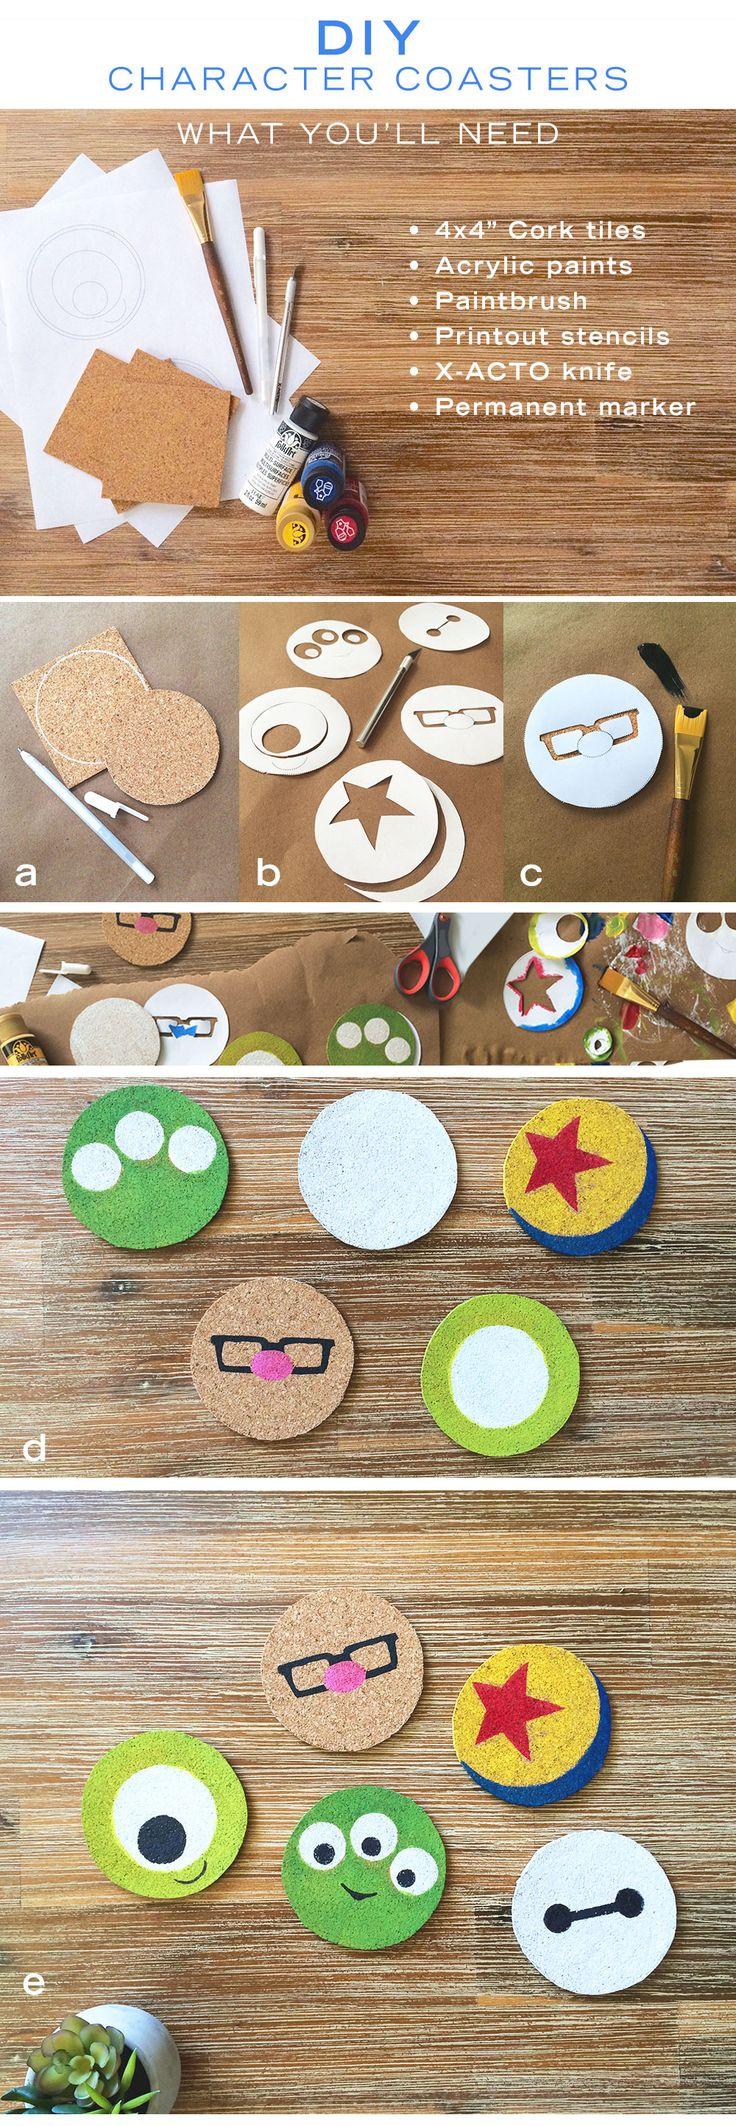 DIY: Minimalist Disney and Disney Pixar character coasters | Monsters Inc. + UP + Big Hero 6 + Toy Story decor | [ https://style.disney.com/living/2016/07/01/diy-minimalist-character-coasters/ ]